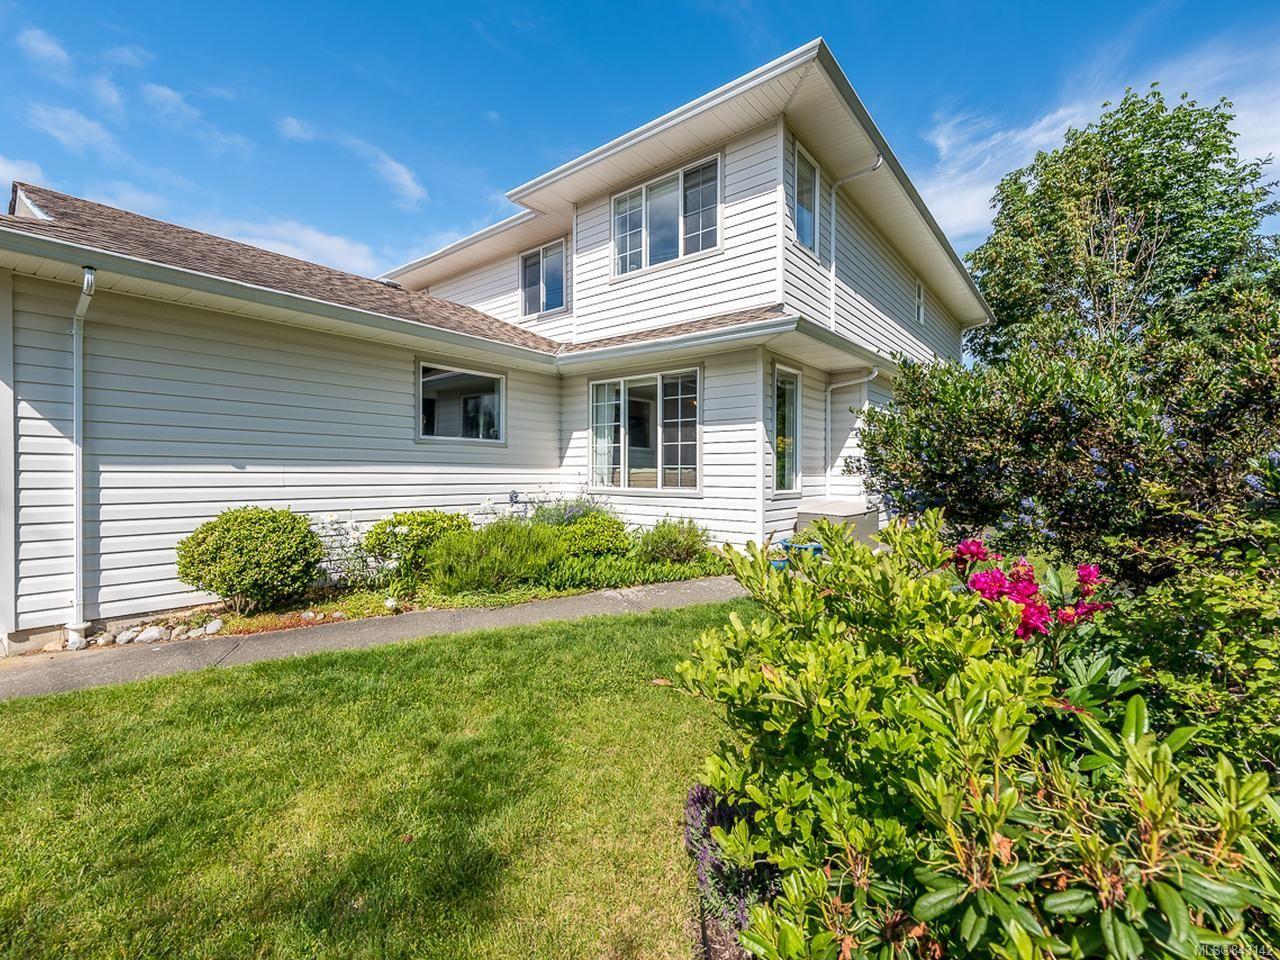 Main Photo: B 2425 1st St in COURTENAY: CV Courtenay City Half Duplex for sale (Comox Valley)  : MLS®# 843142